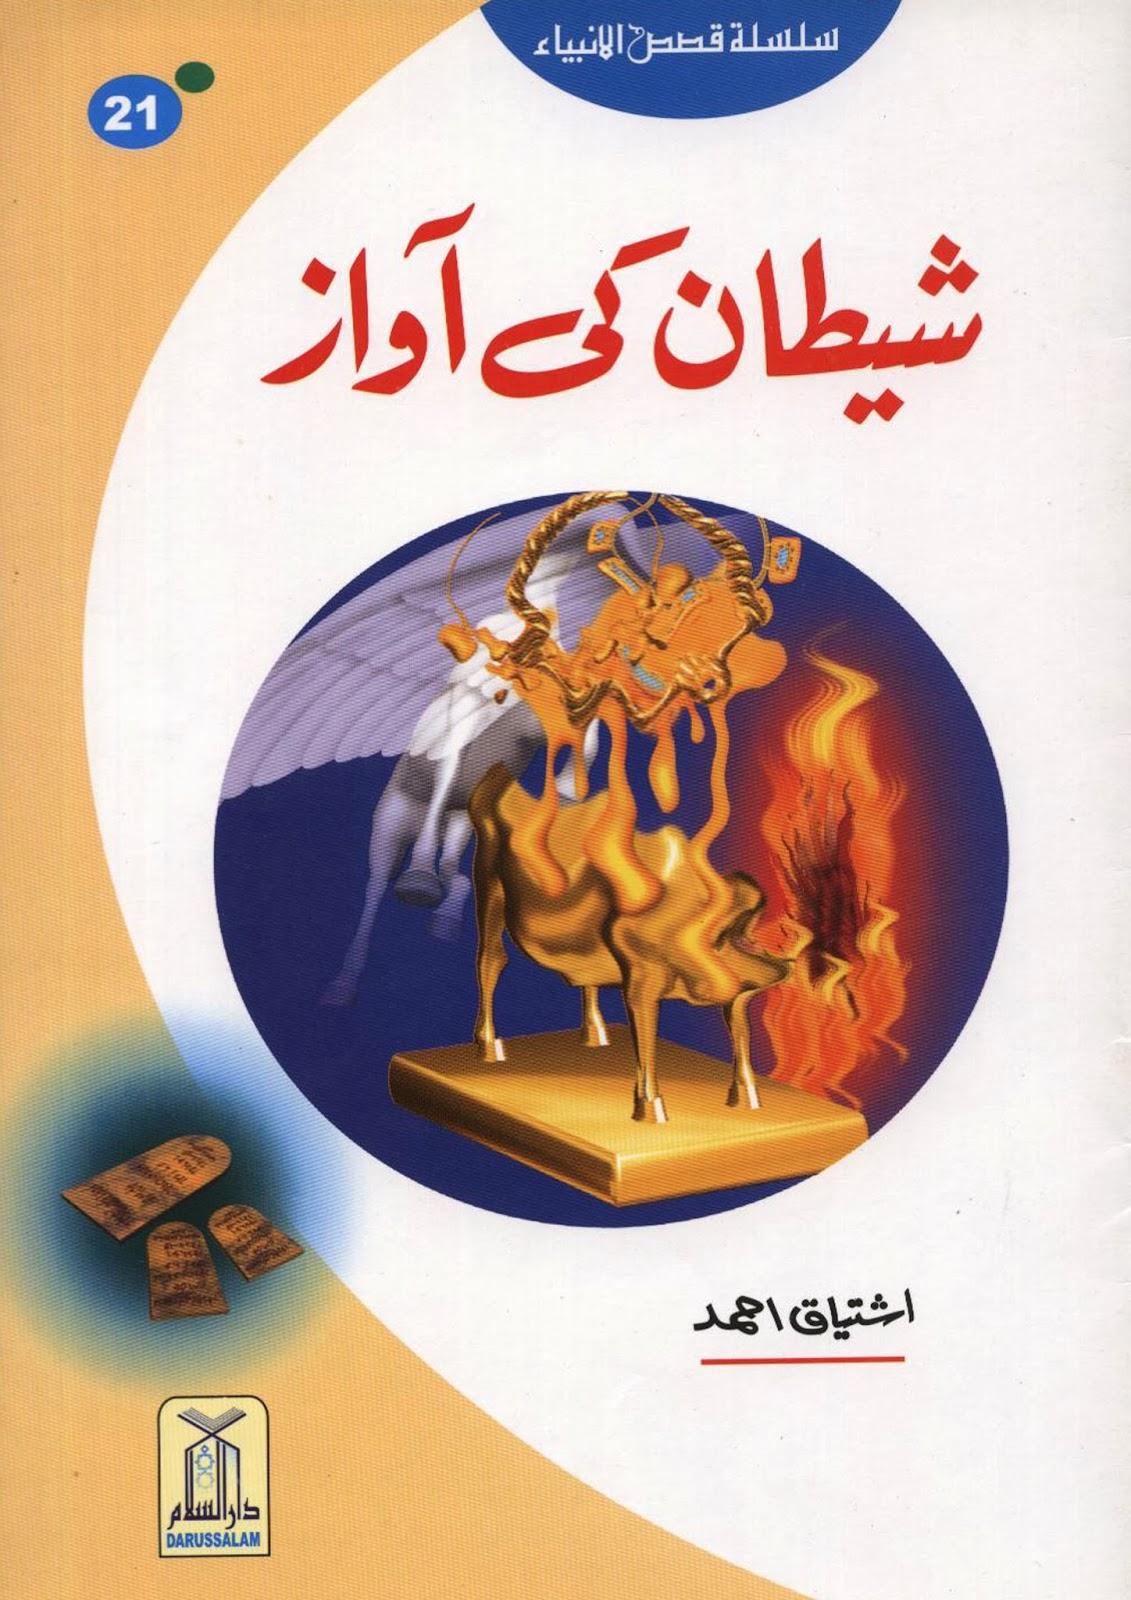 http://urduguru1.blogspot.com/2014/03/shetan-ki-aawaz-prophet-haroon-as.html